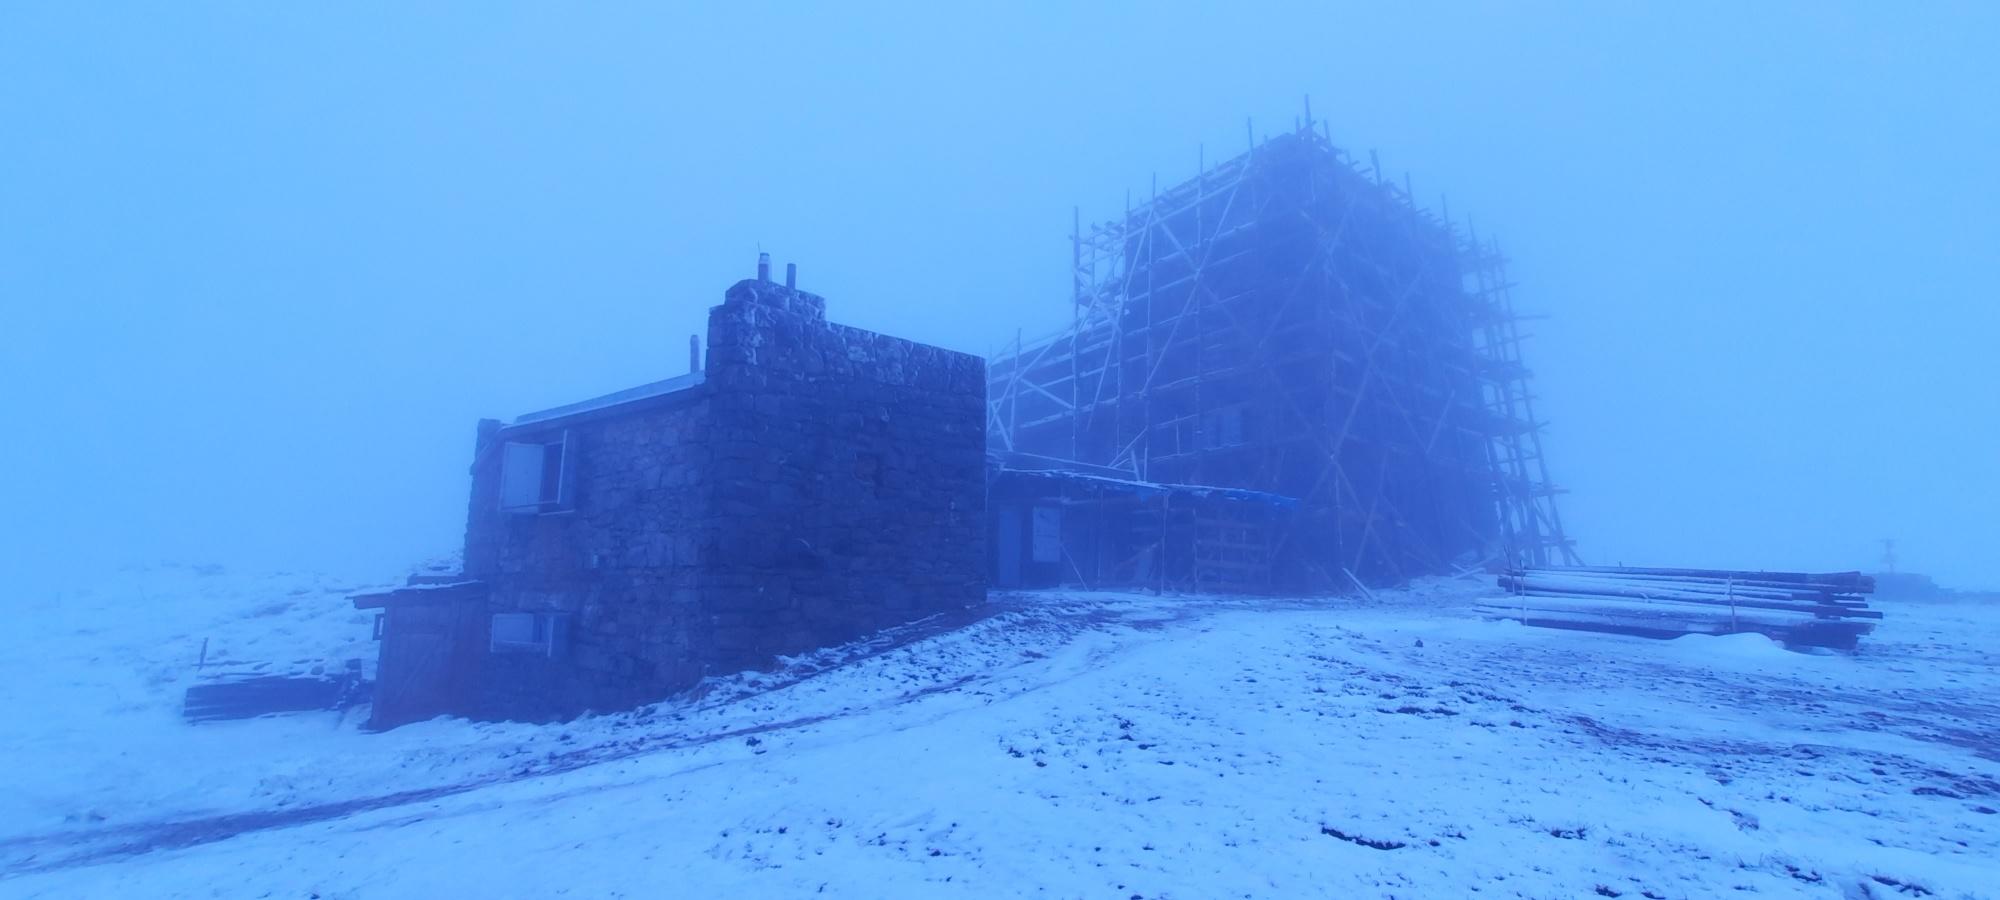 На високогір'ї Закарпаття випав сніг